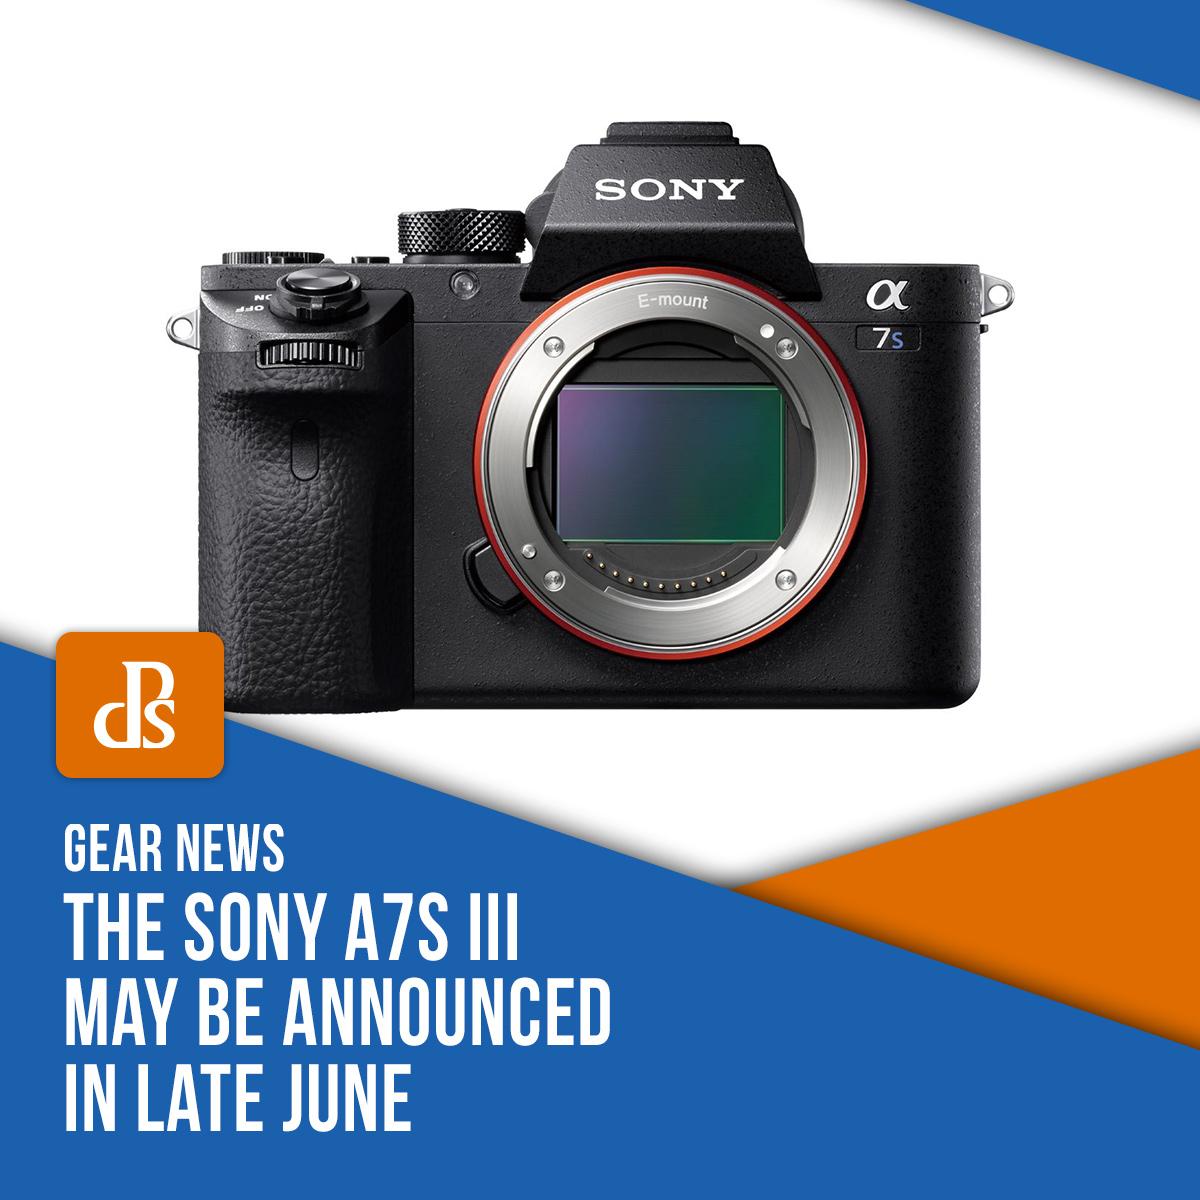 dps-sony-a7s-iii-news